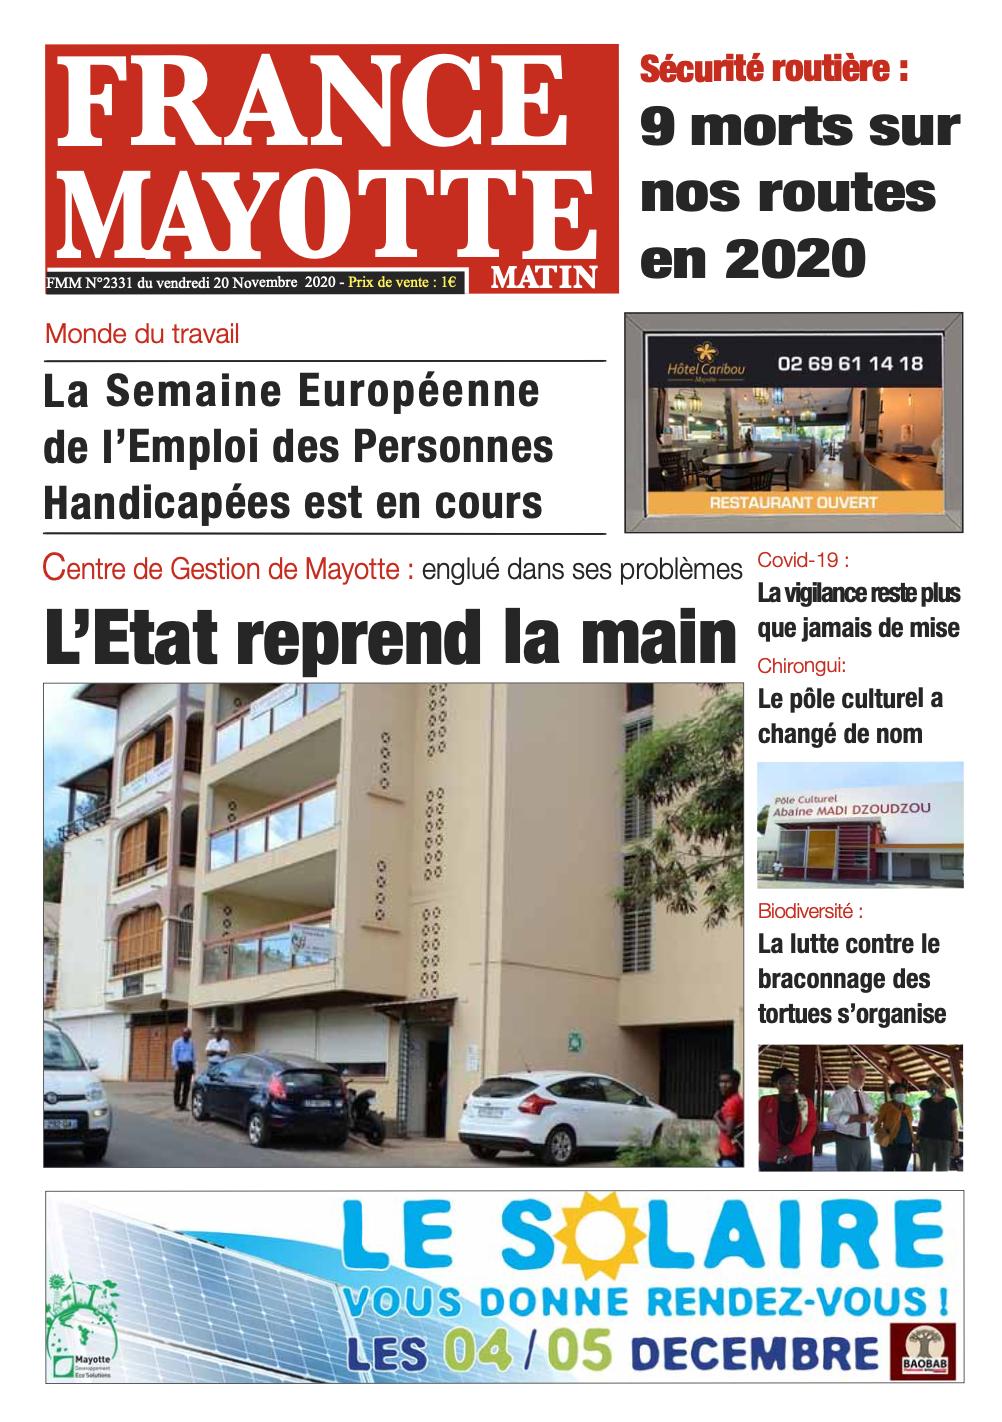 France Mayotte Vendredi 20 novembre 2020